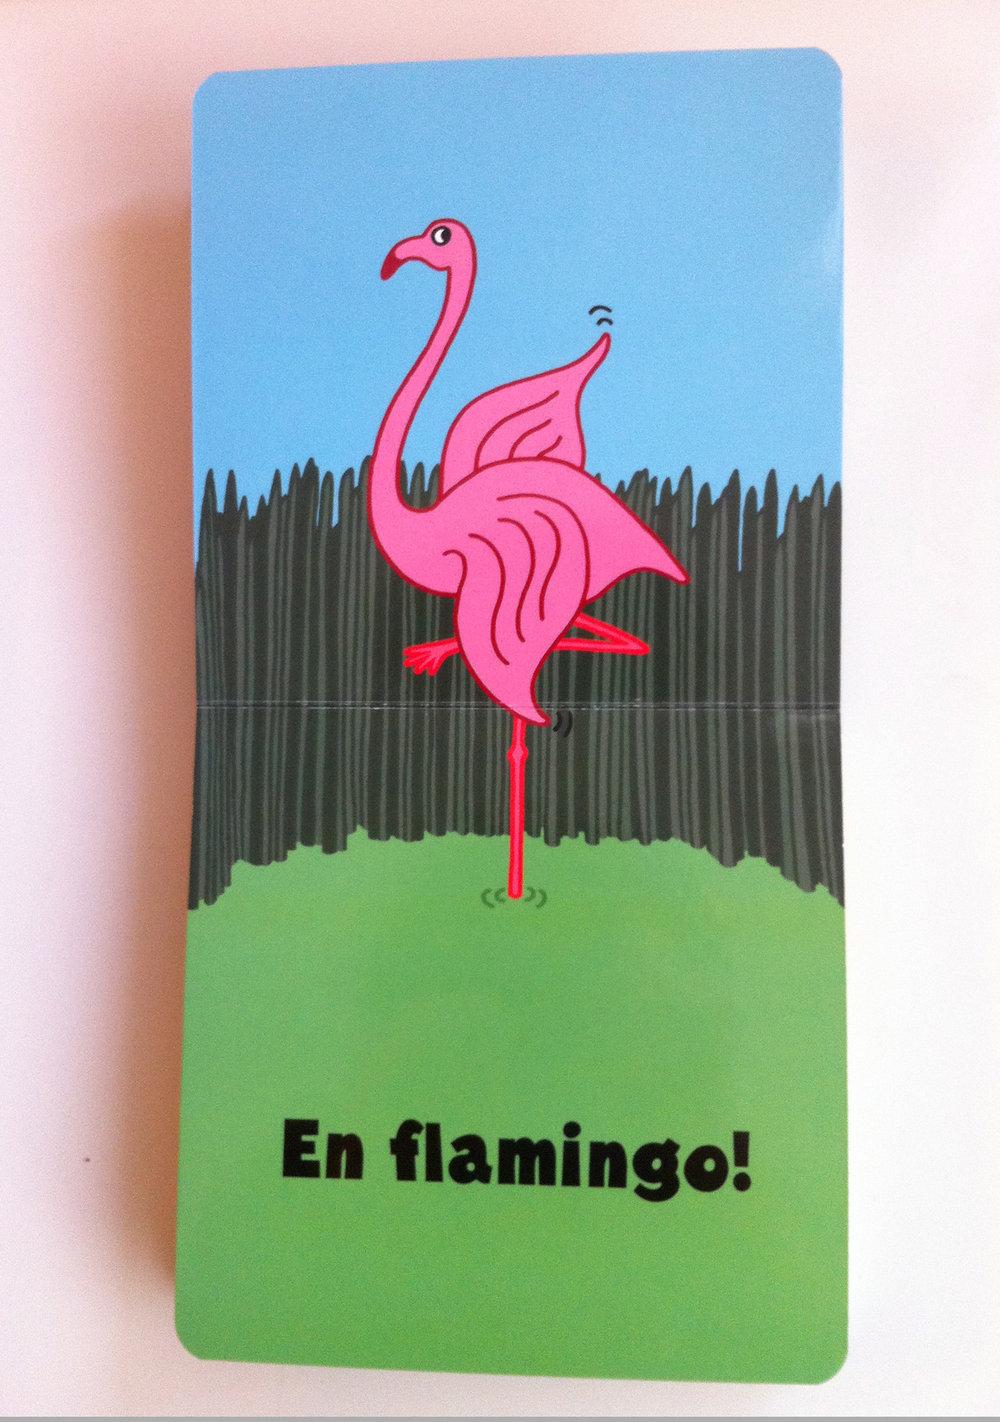 flamingo_b.jpg